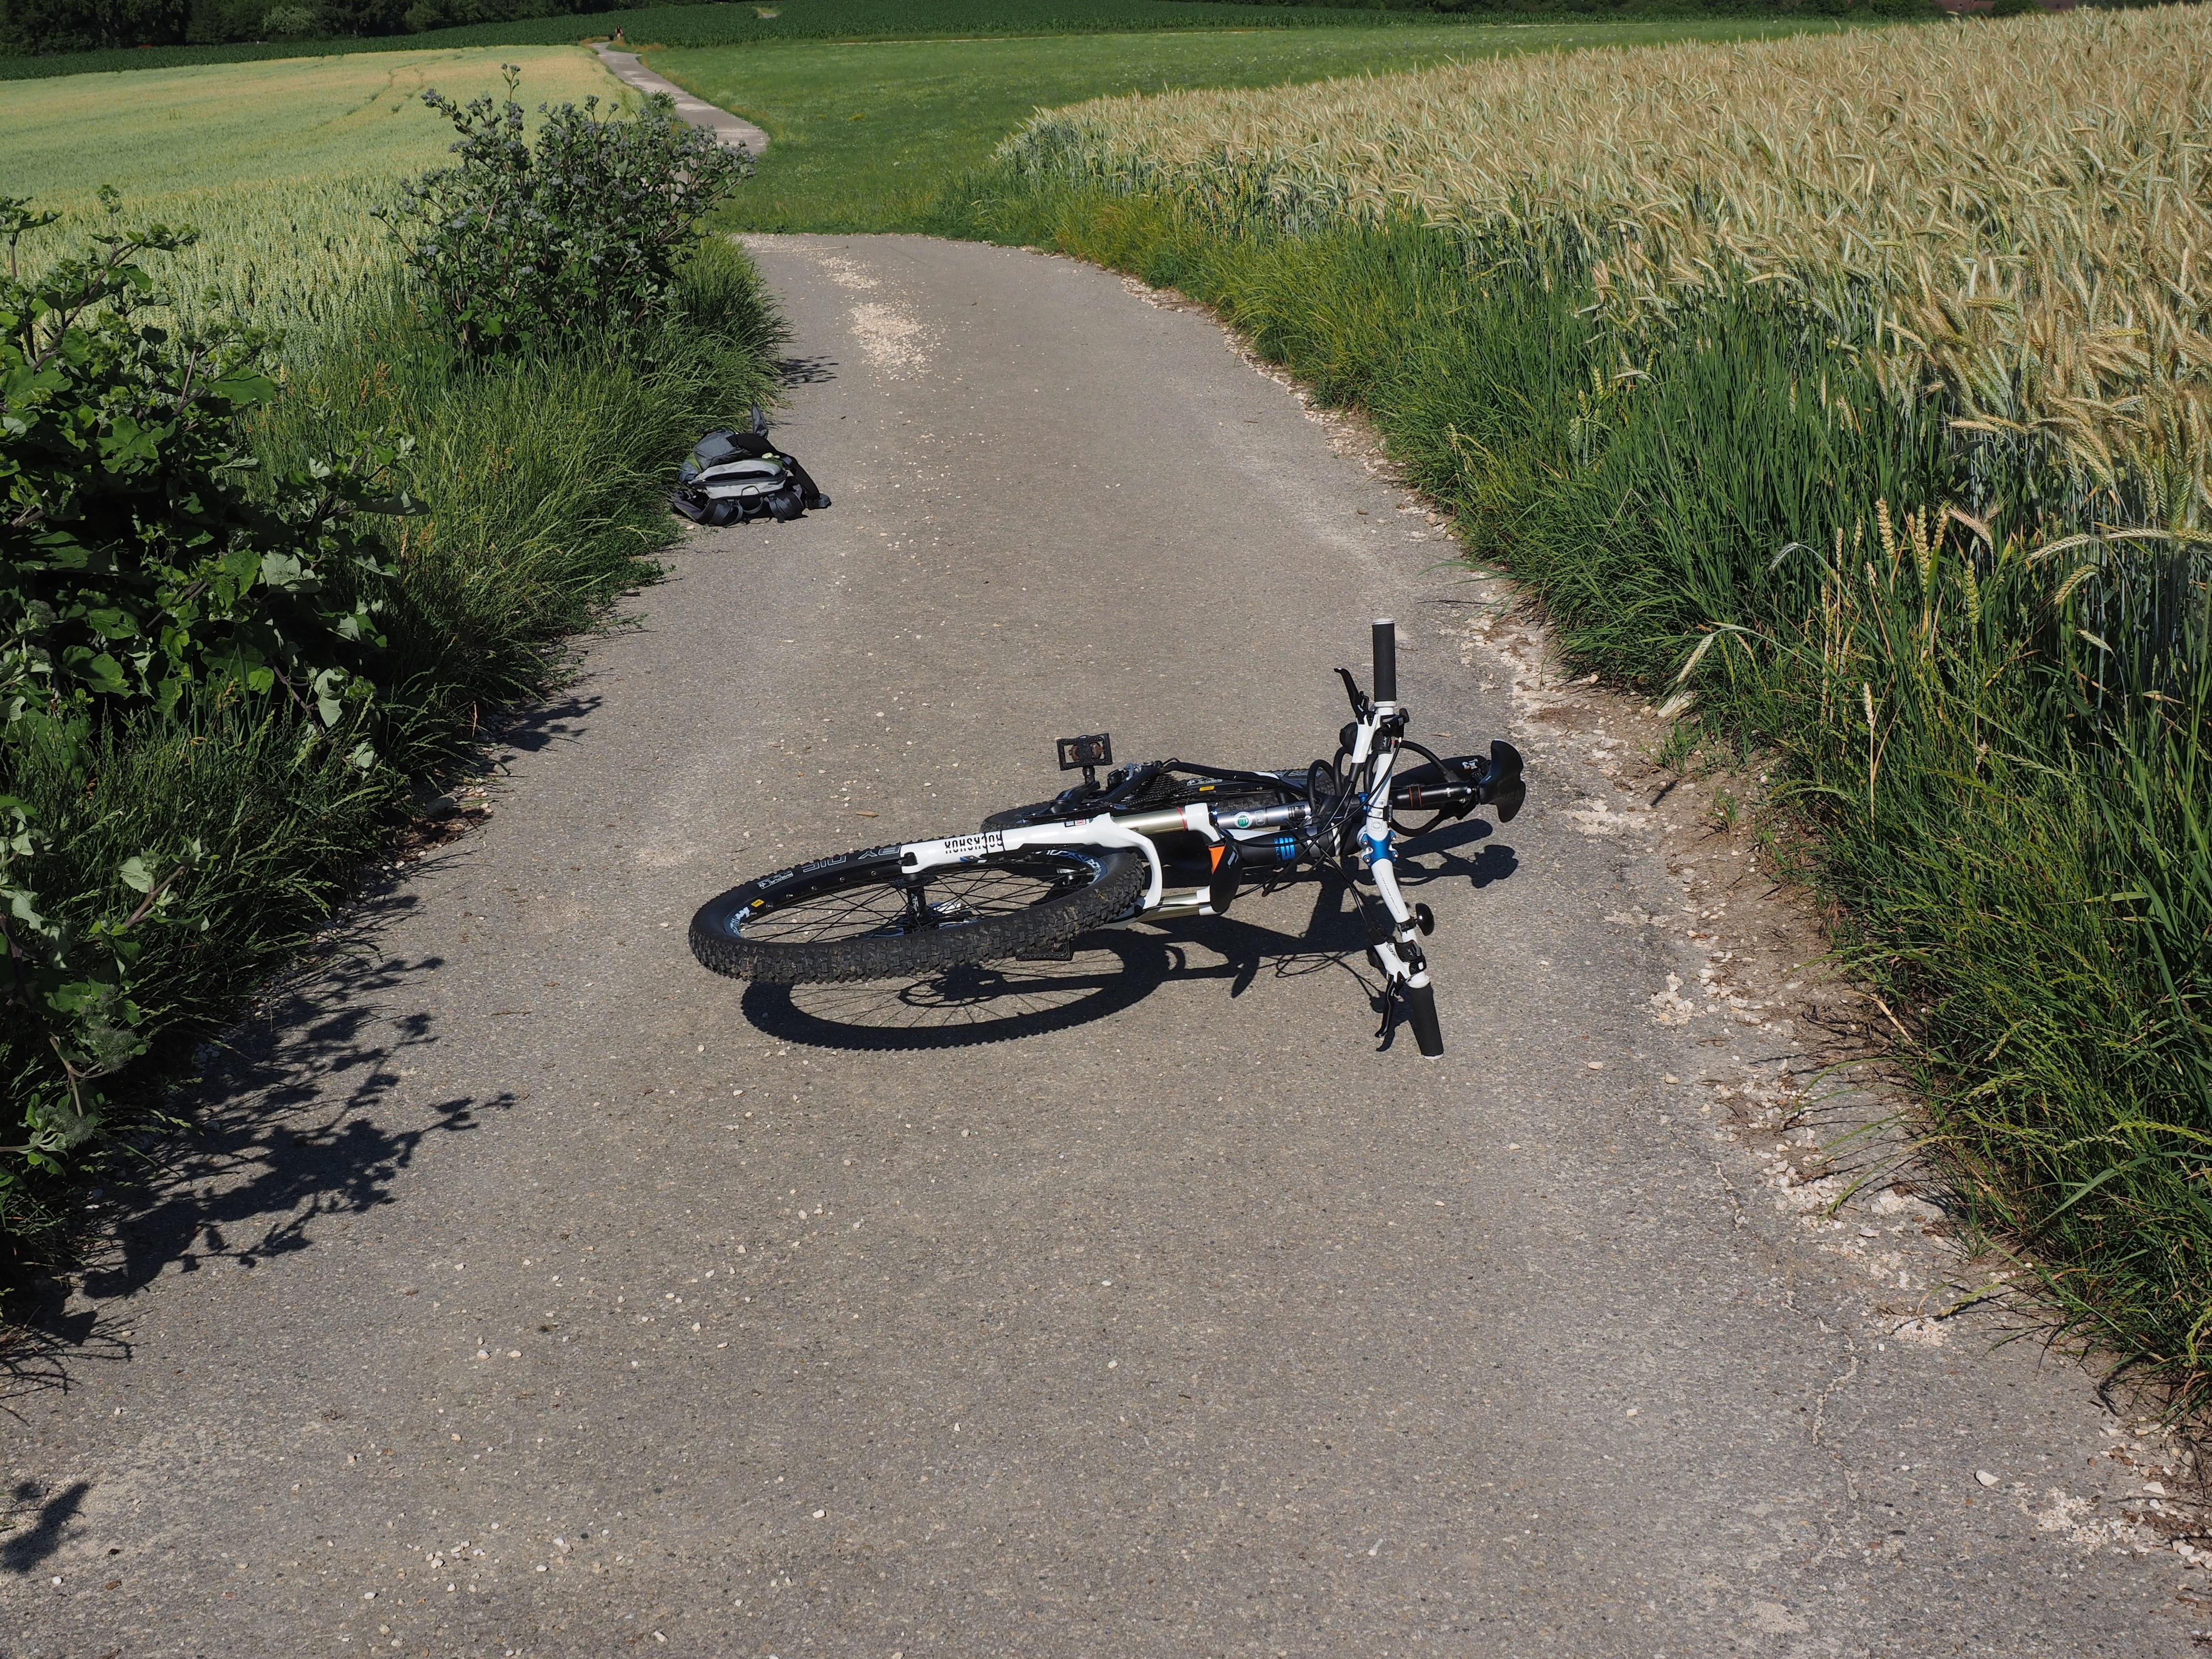 Free Images : fall, bicycle, asphalt, vehicle, motorcycle, soil ...